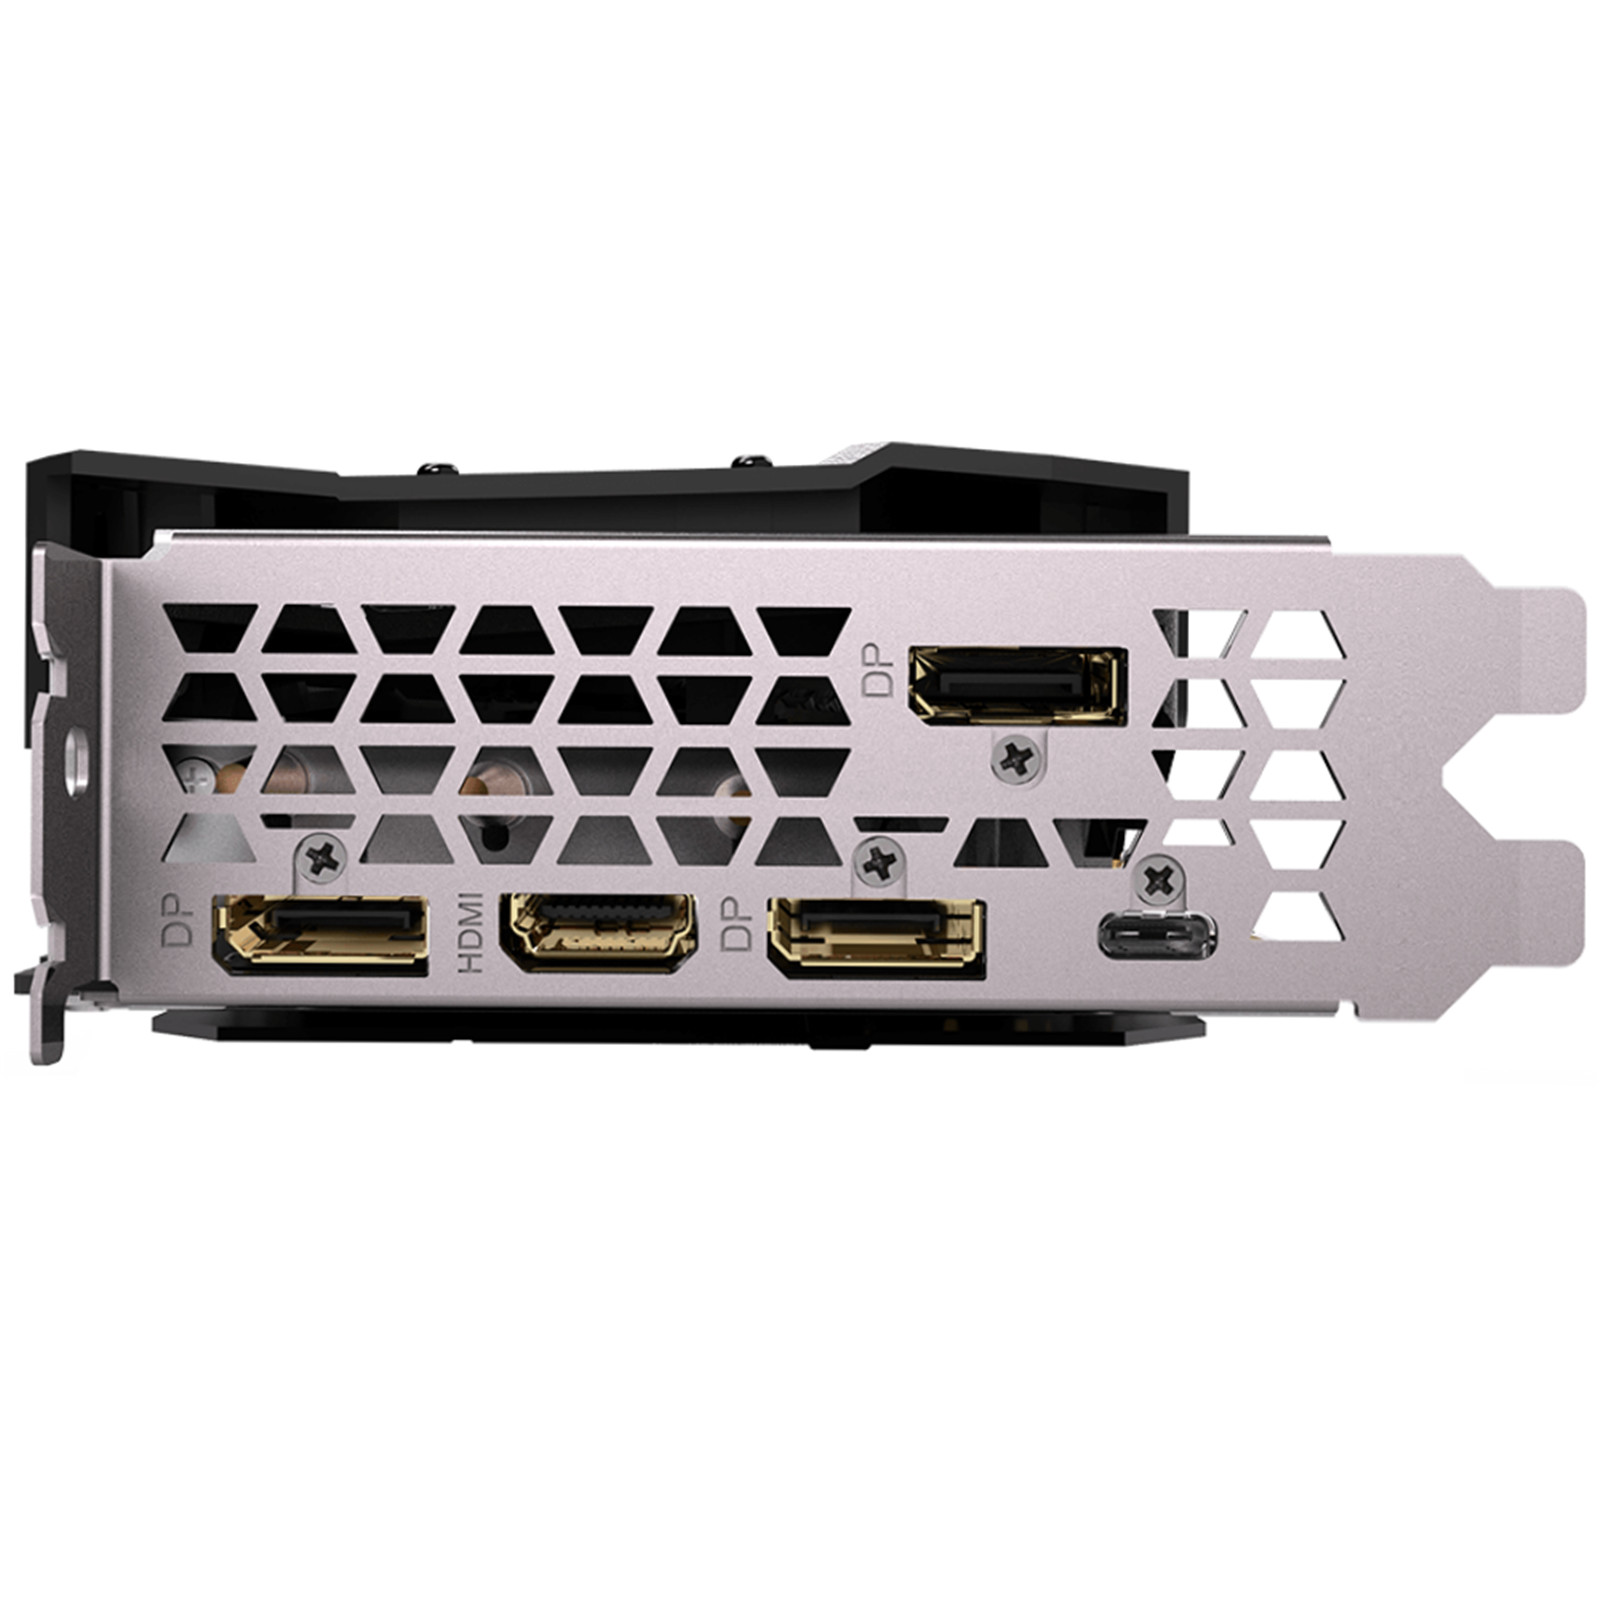 Buy the Gigabyte Geforce RTX 2080 Gaming OC RGB Fusion 8GB DDR6, GPU Upto  1830    ( GV-N2080GAMING OC-8GC ) online